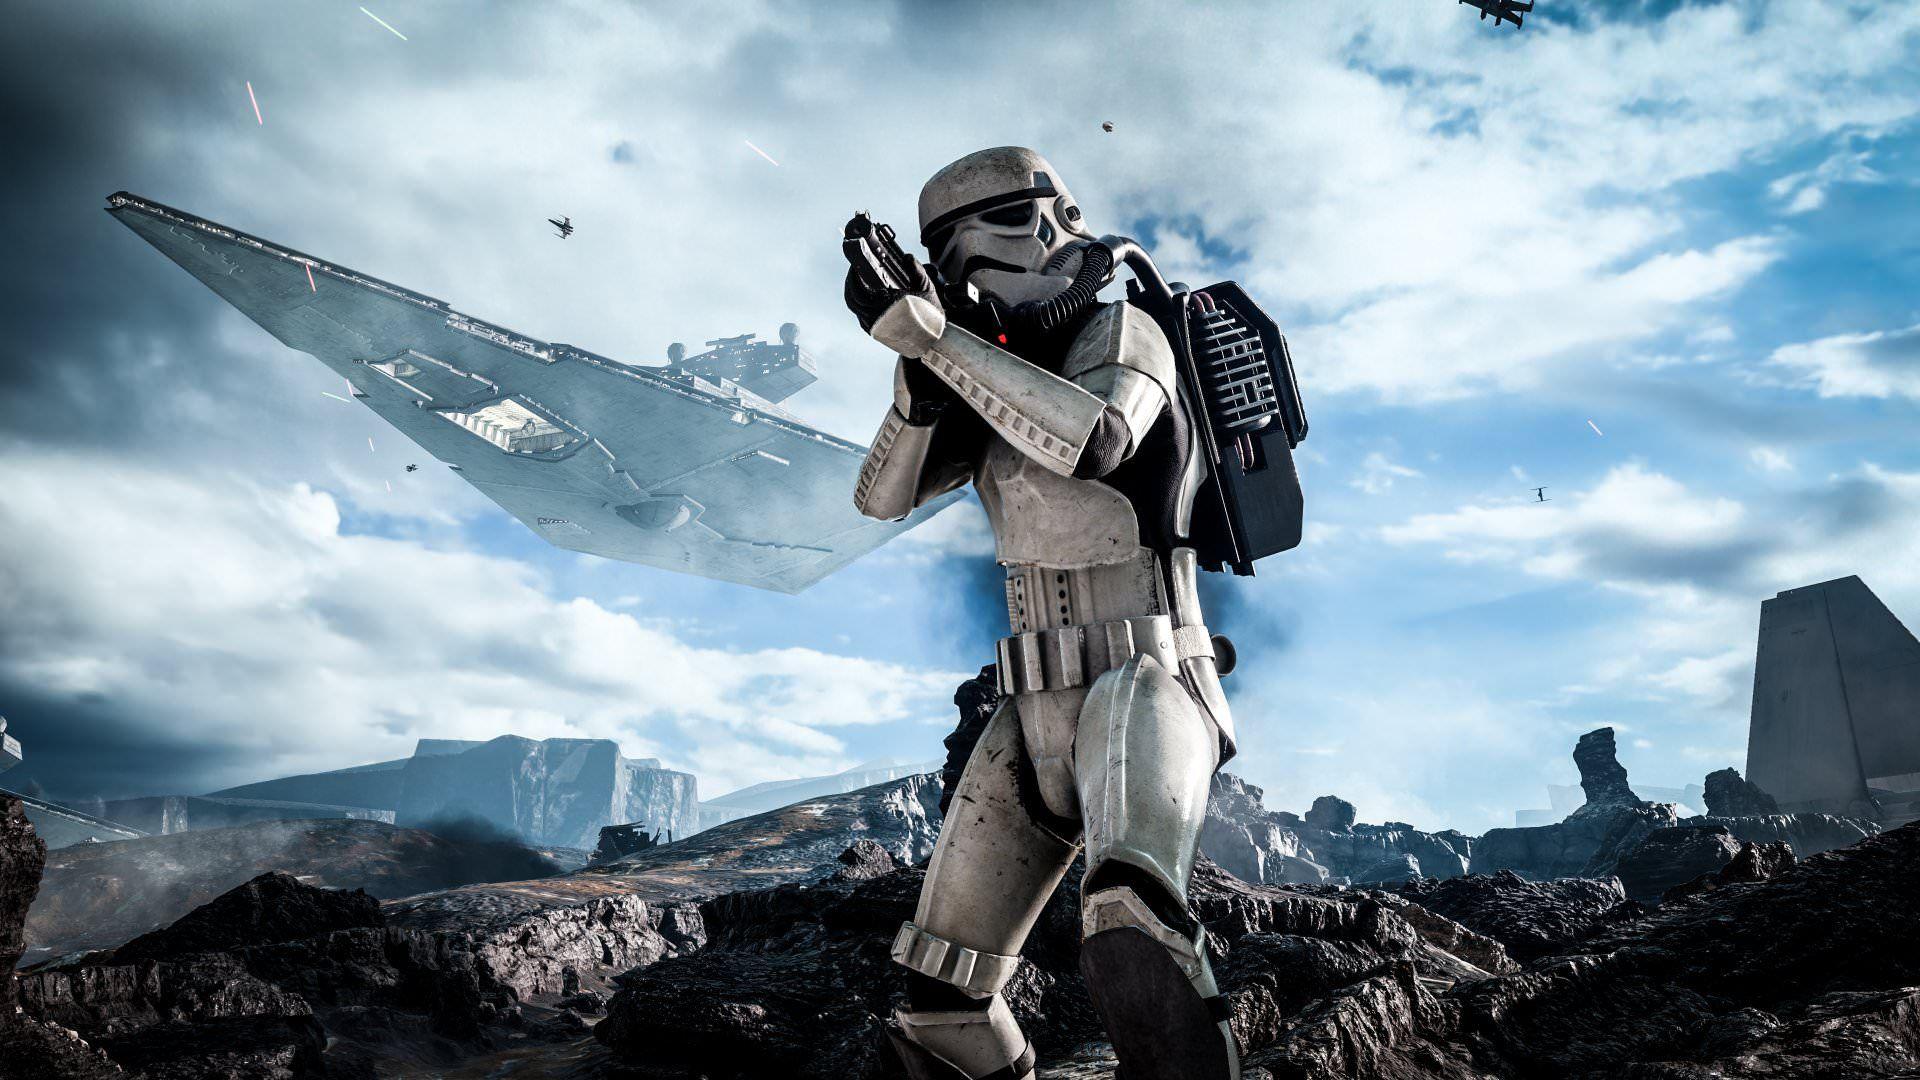 30 High Resolution Star Wars Wallpapers HD Star wars